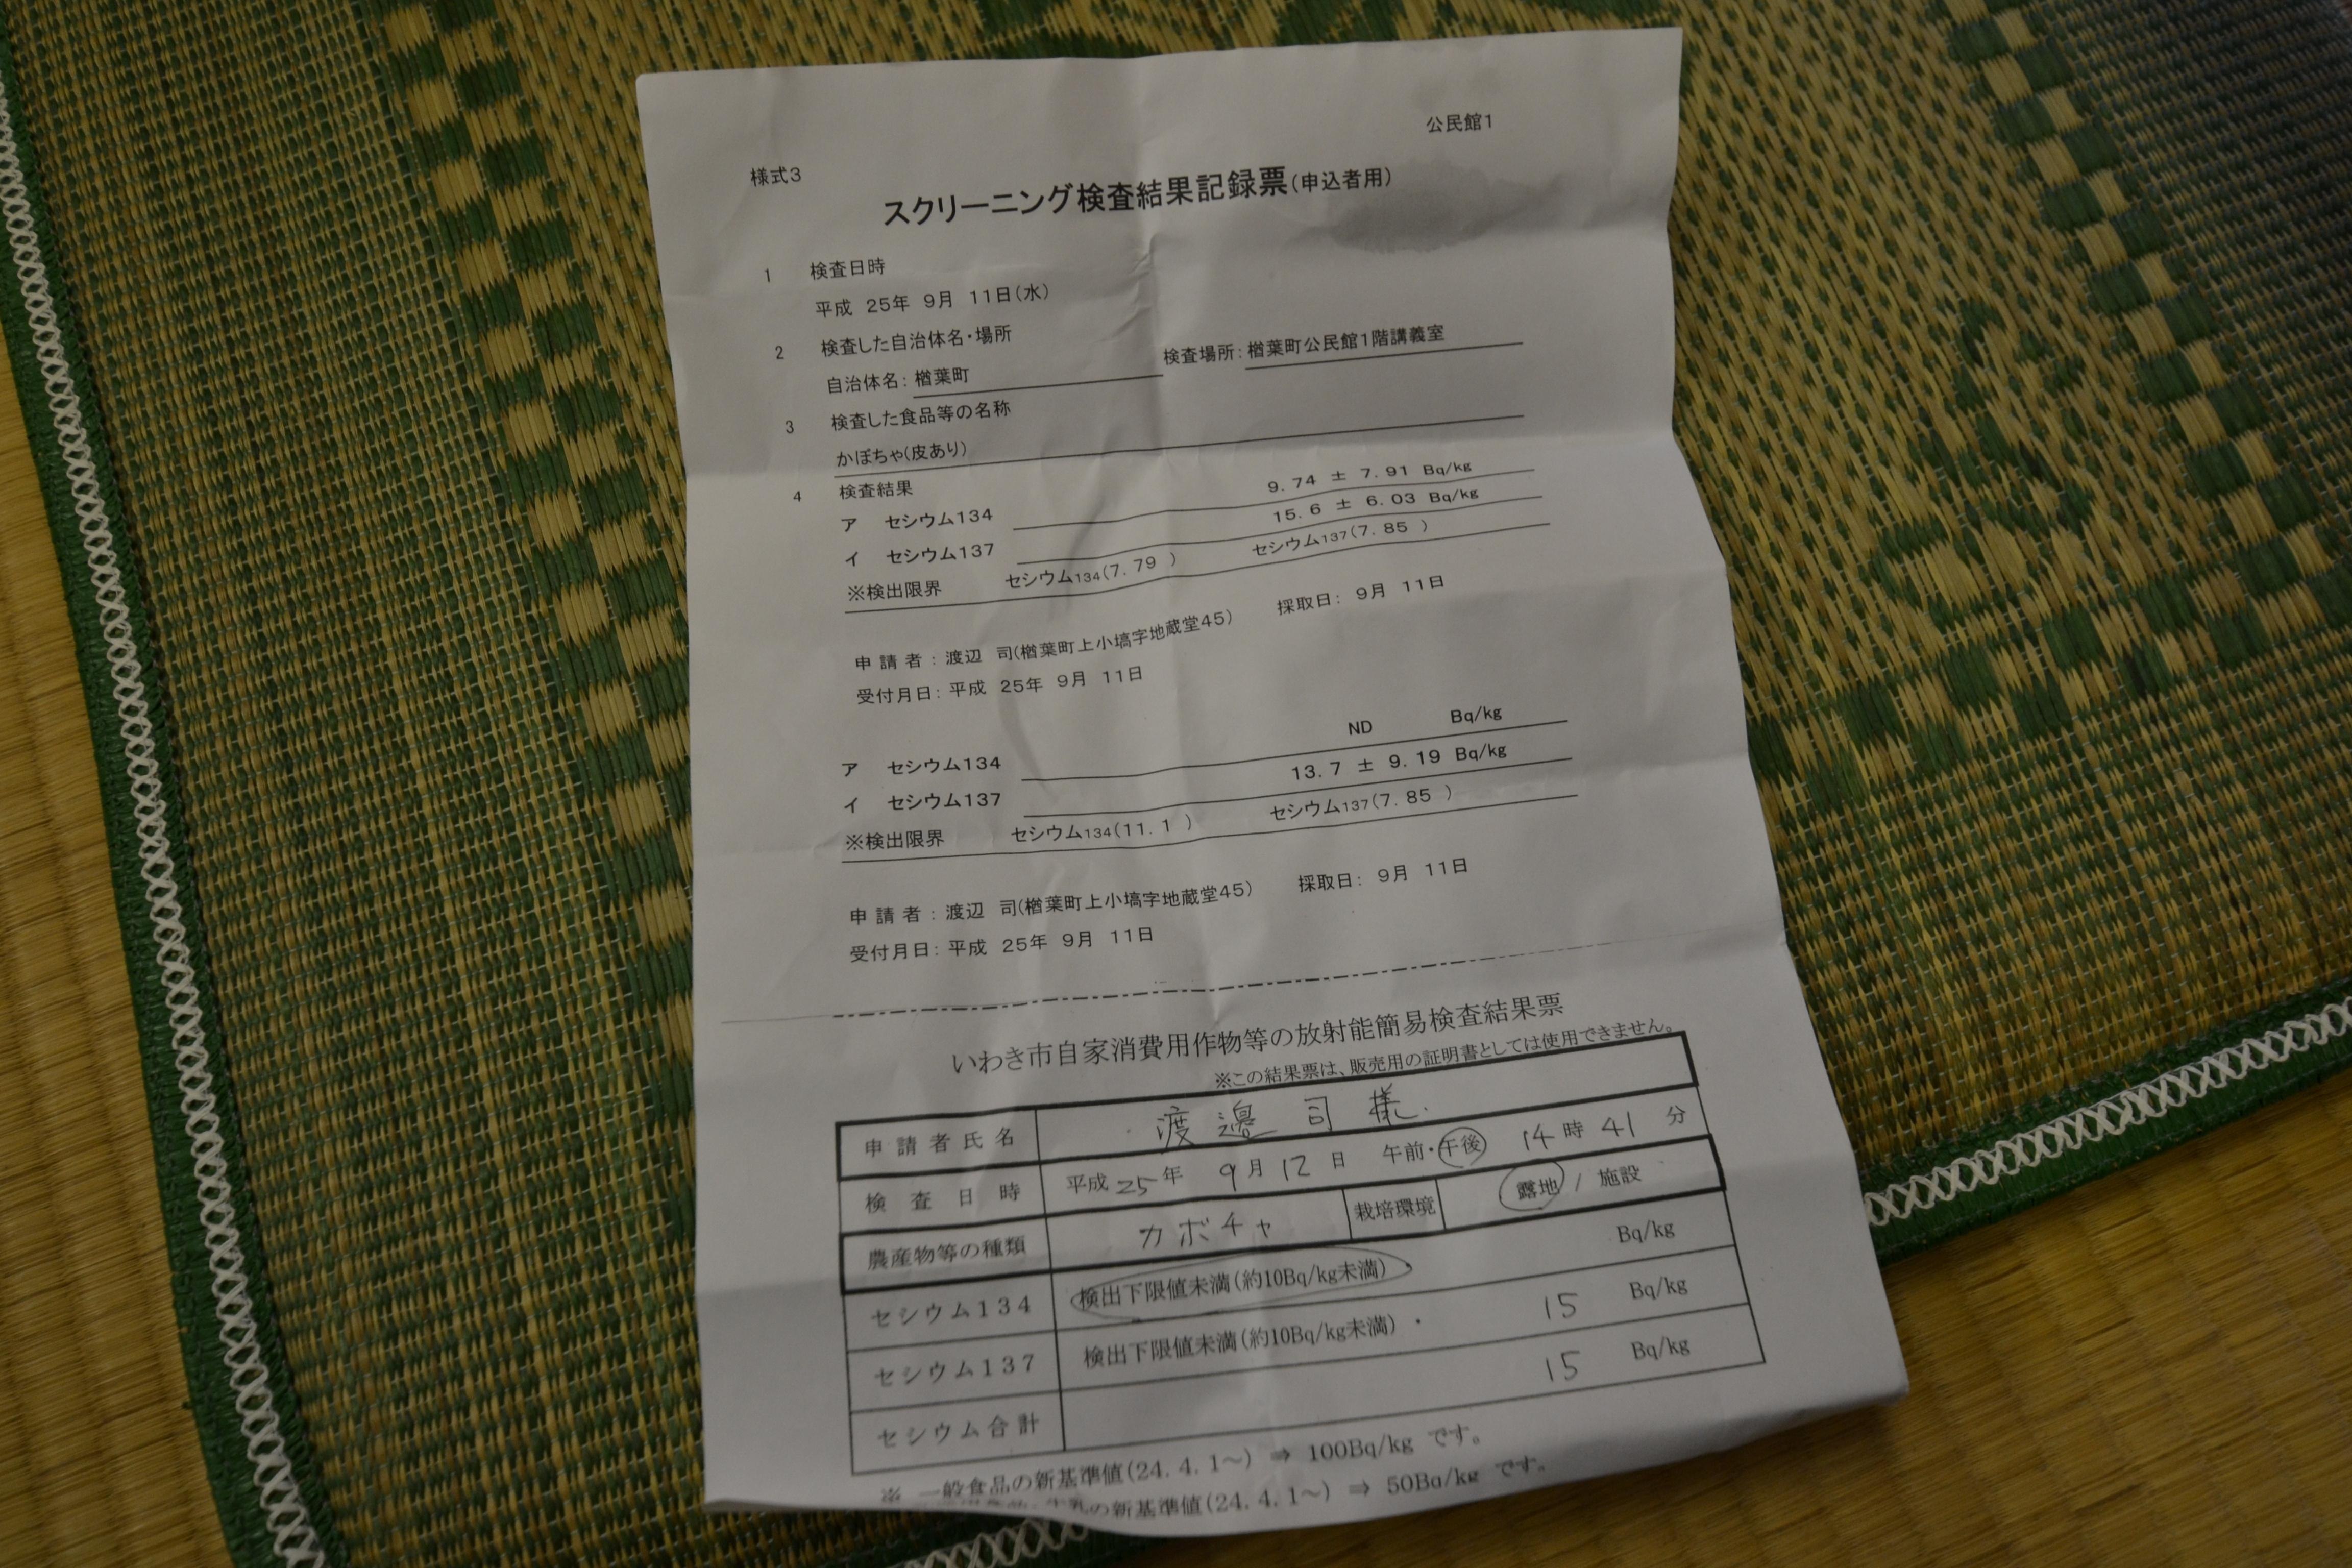 watari ushinoya chef certificate food safety for customers.JPG